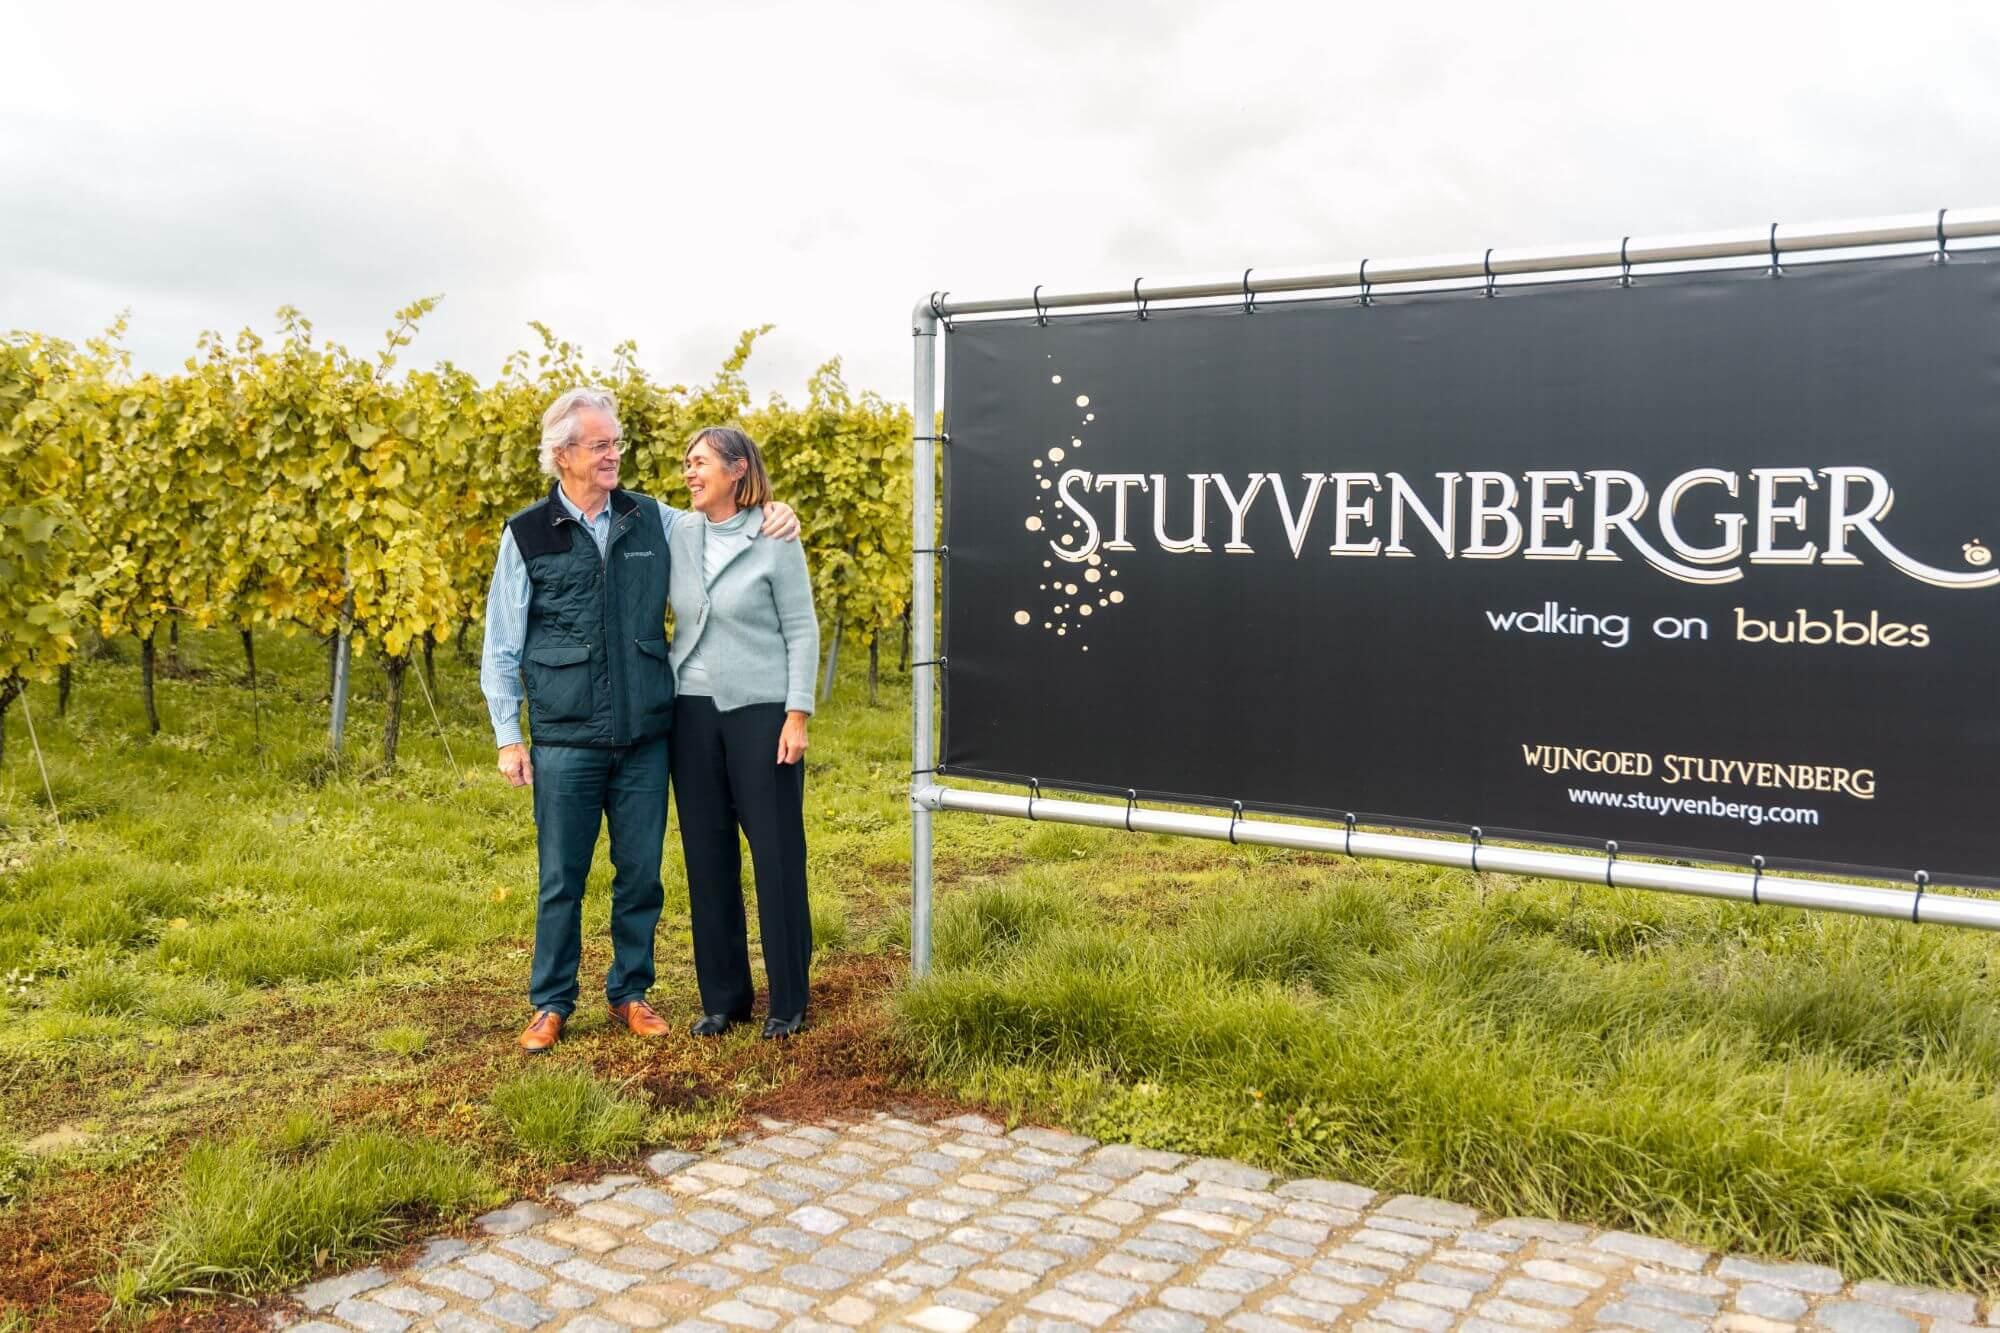 Stuyvenberger.jpg